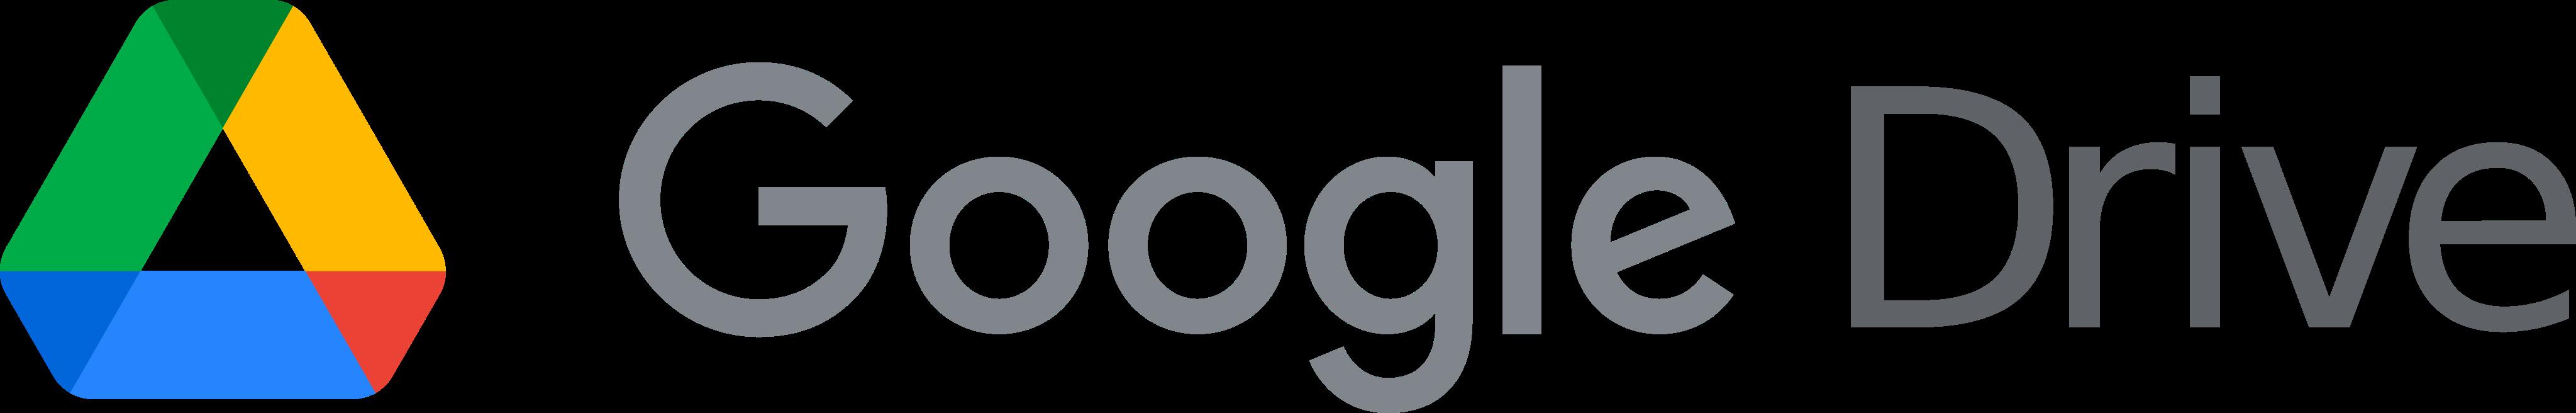 google drive logo 4 - Google Drive Logo